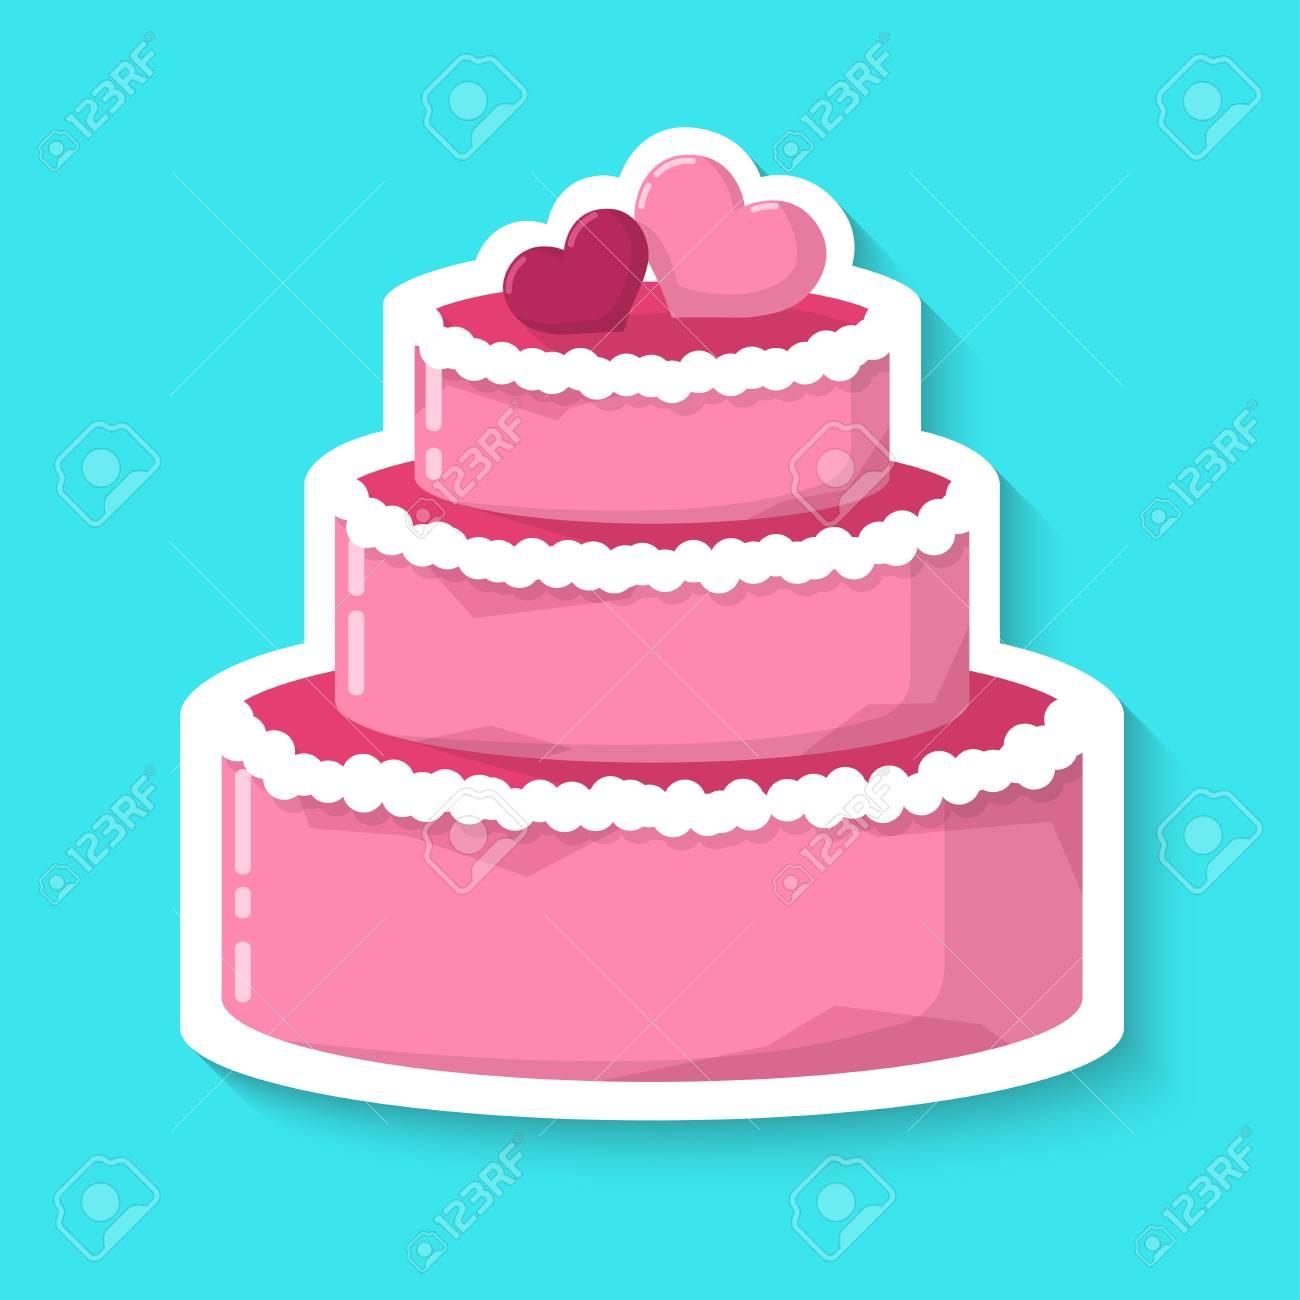 Wedding Cake Isolated On A Blue Background Big Pink Cake Realistic